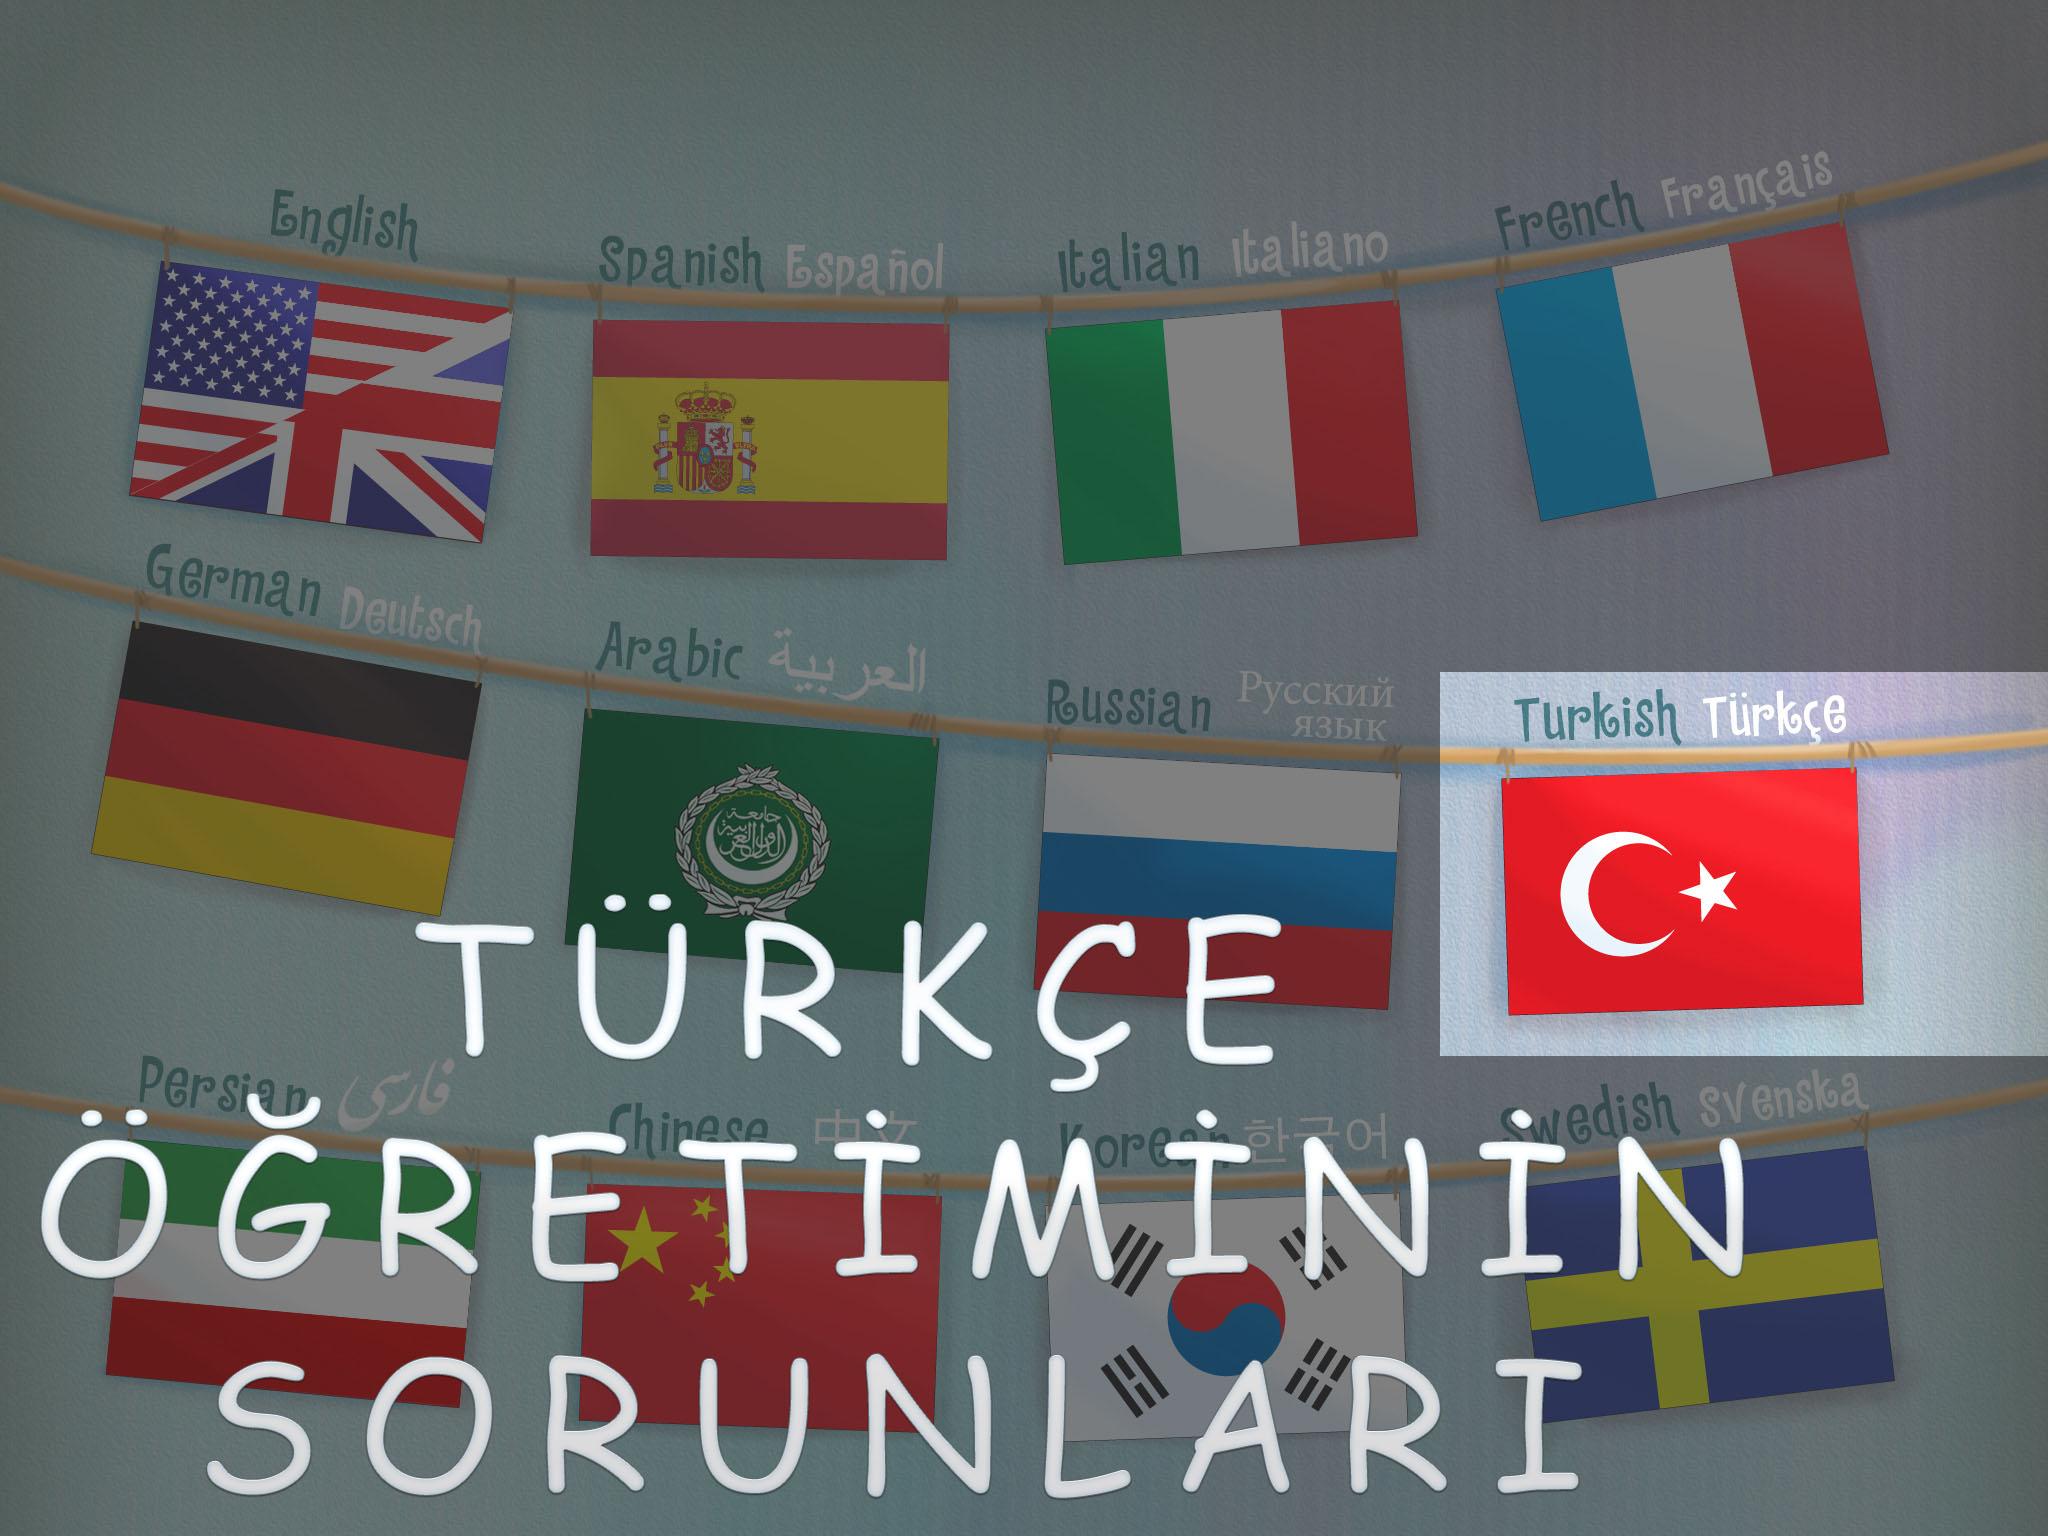 turkceogretimisorunlar.jpg - 302,81 kB